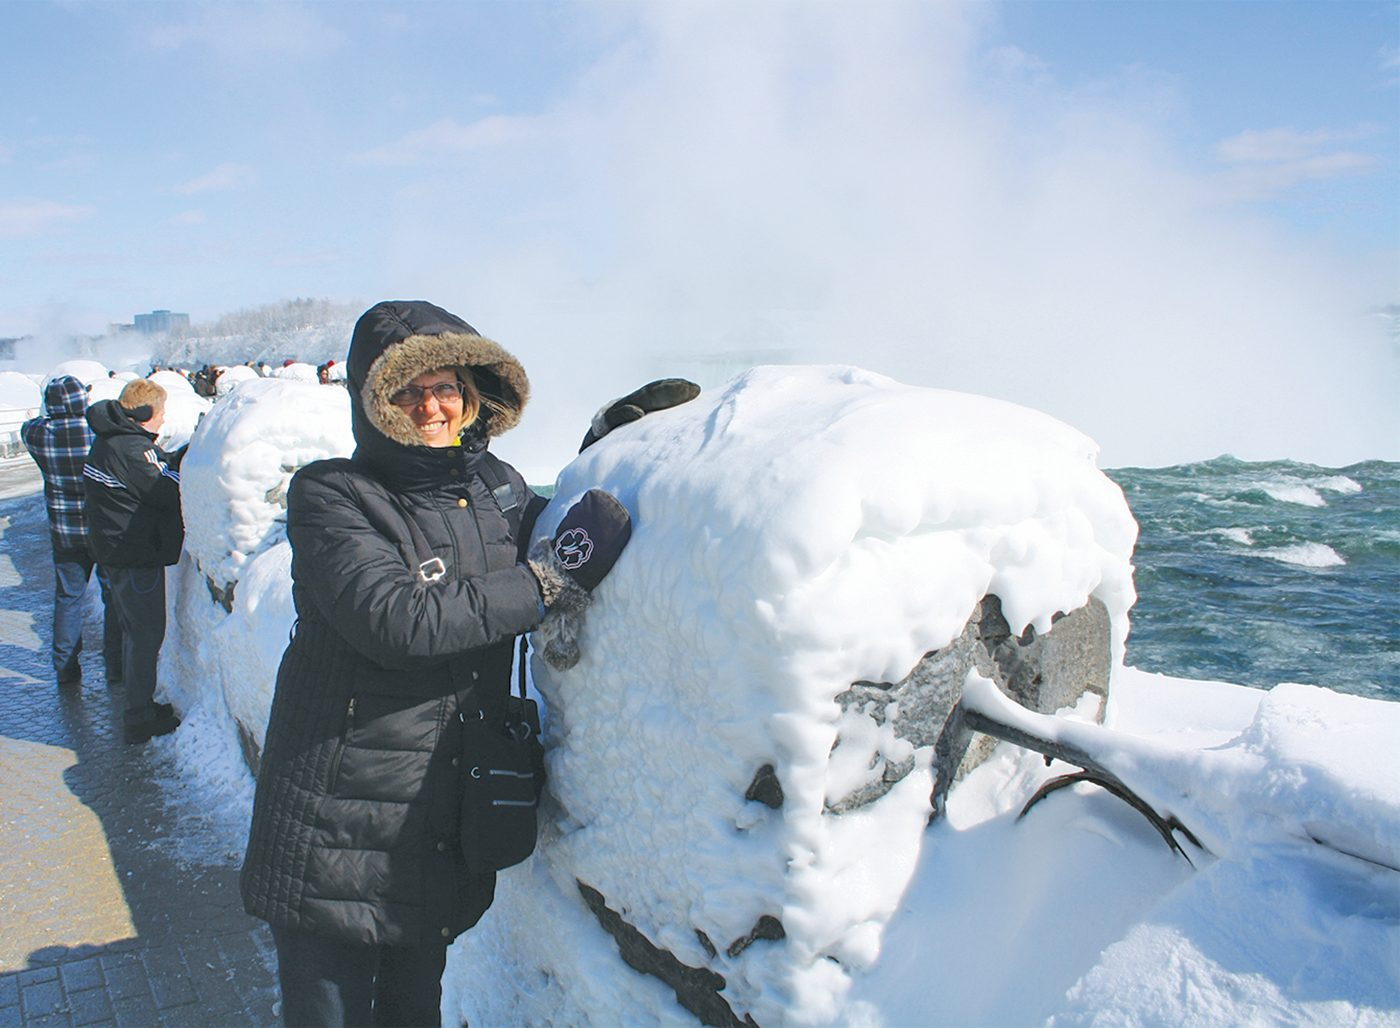 Niagara Falls In Winter - Ice Build Up On Guardrail